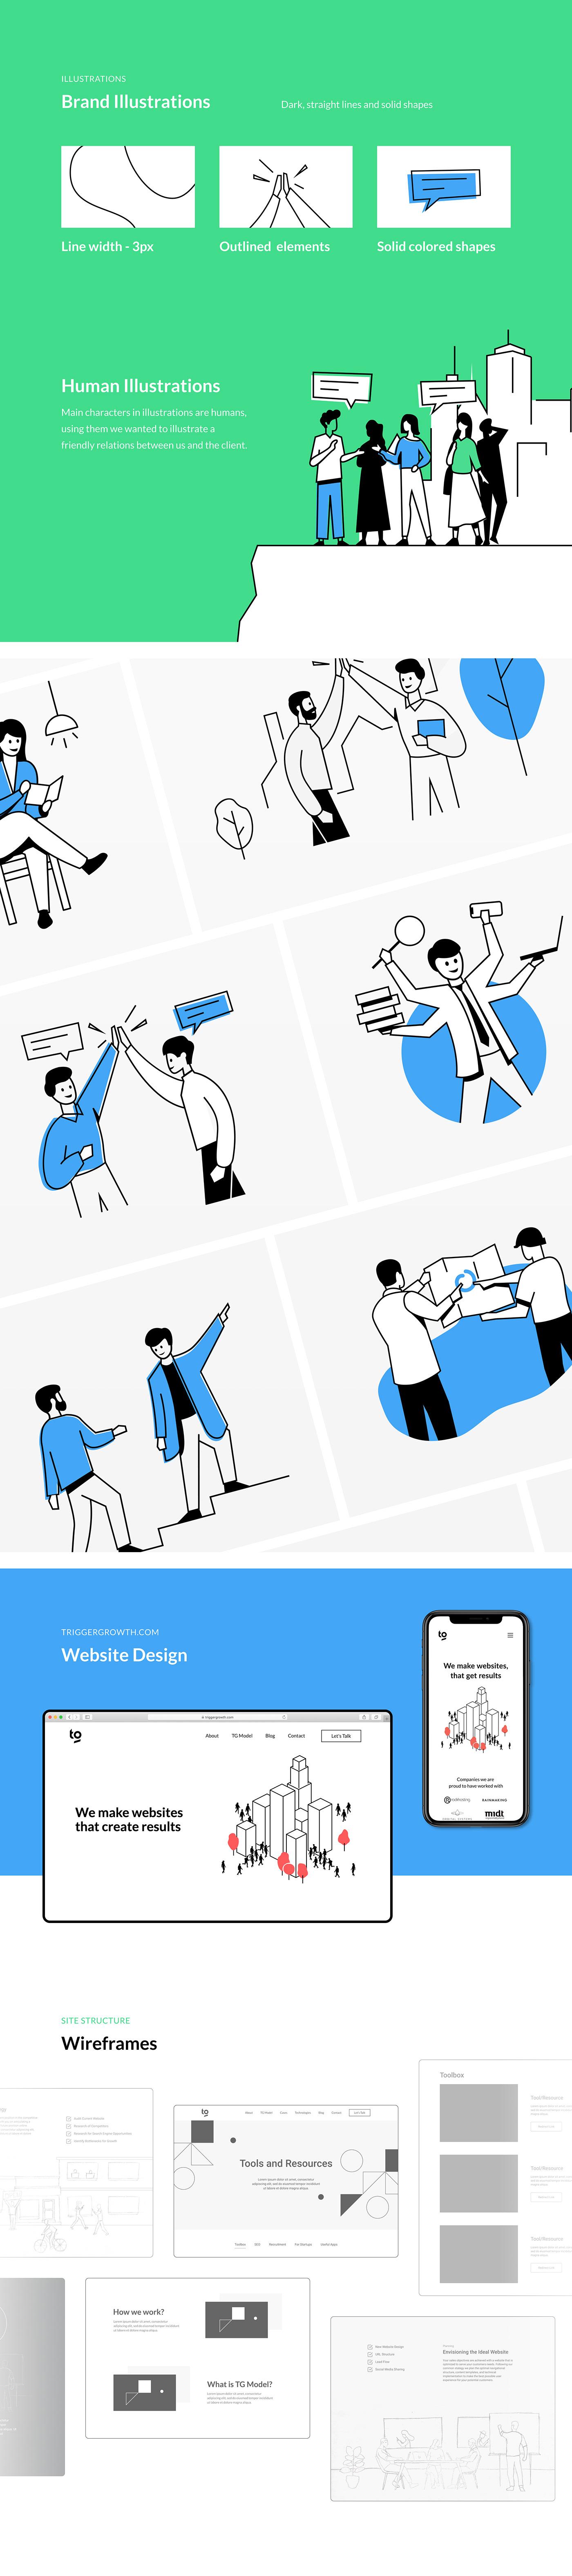 brand identity branding  illustrations Logo Design redesign revamp Trigger Growth UI/UX Web Design